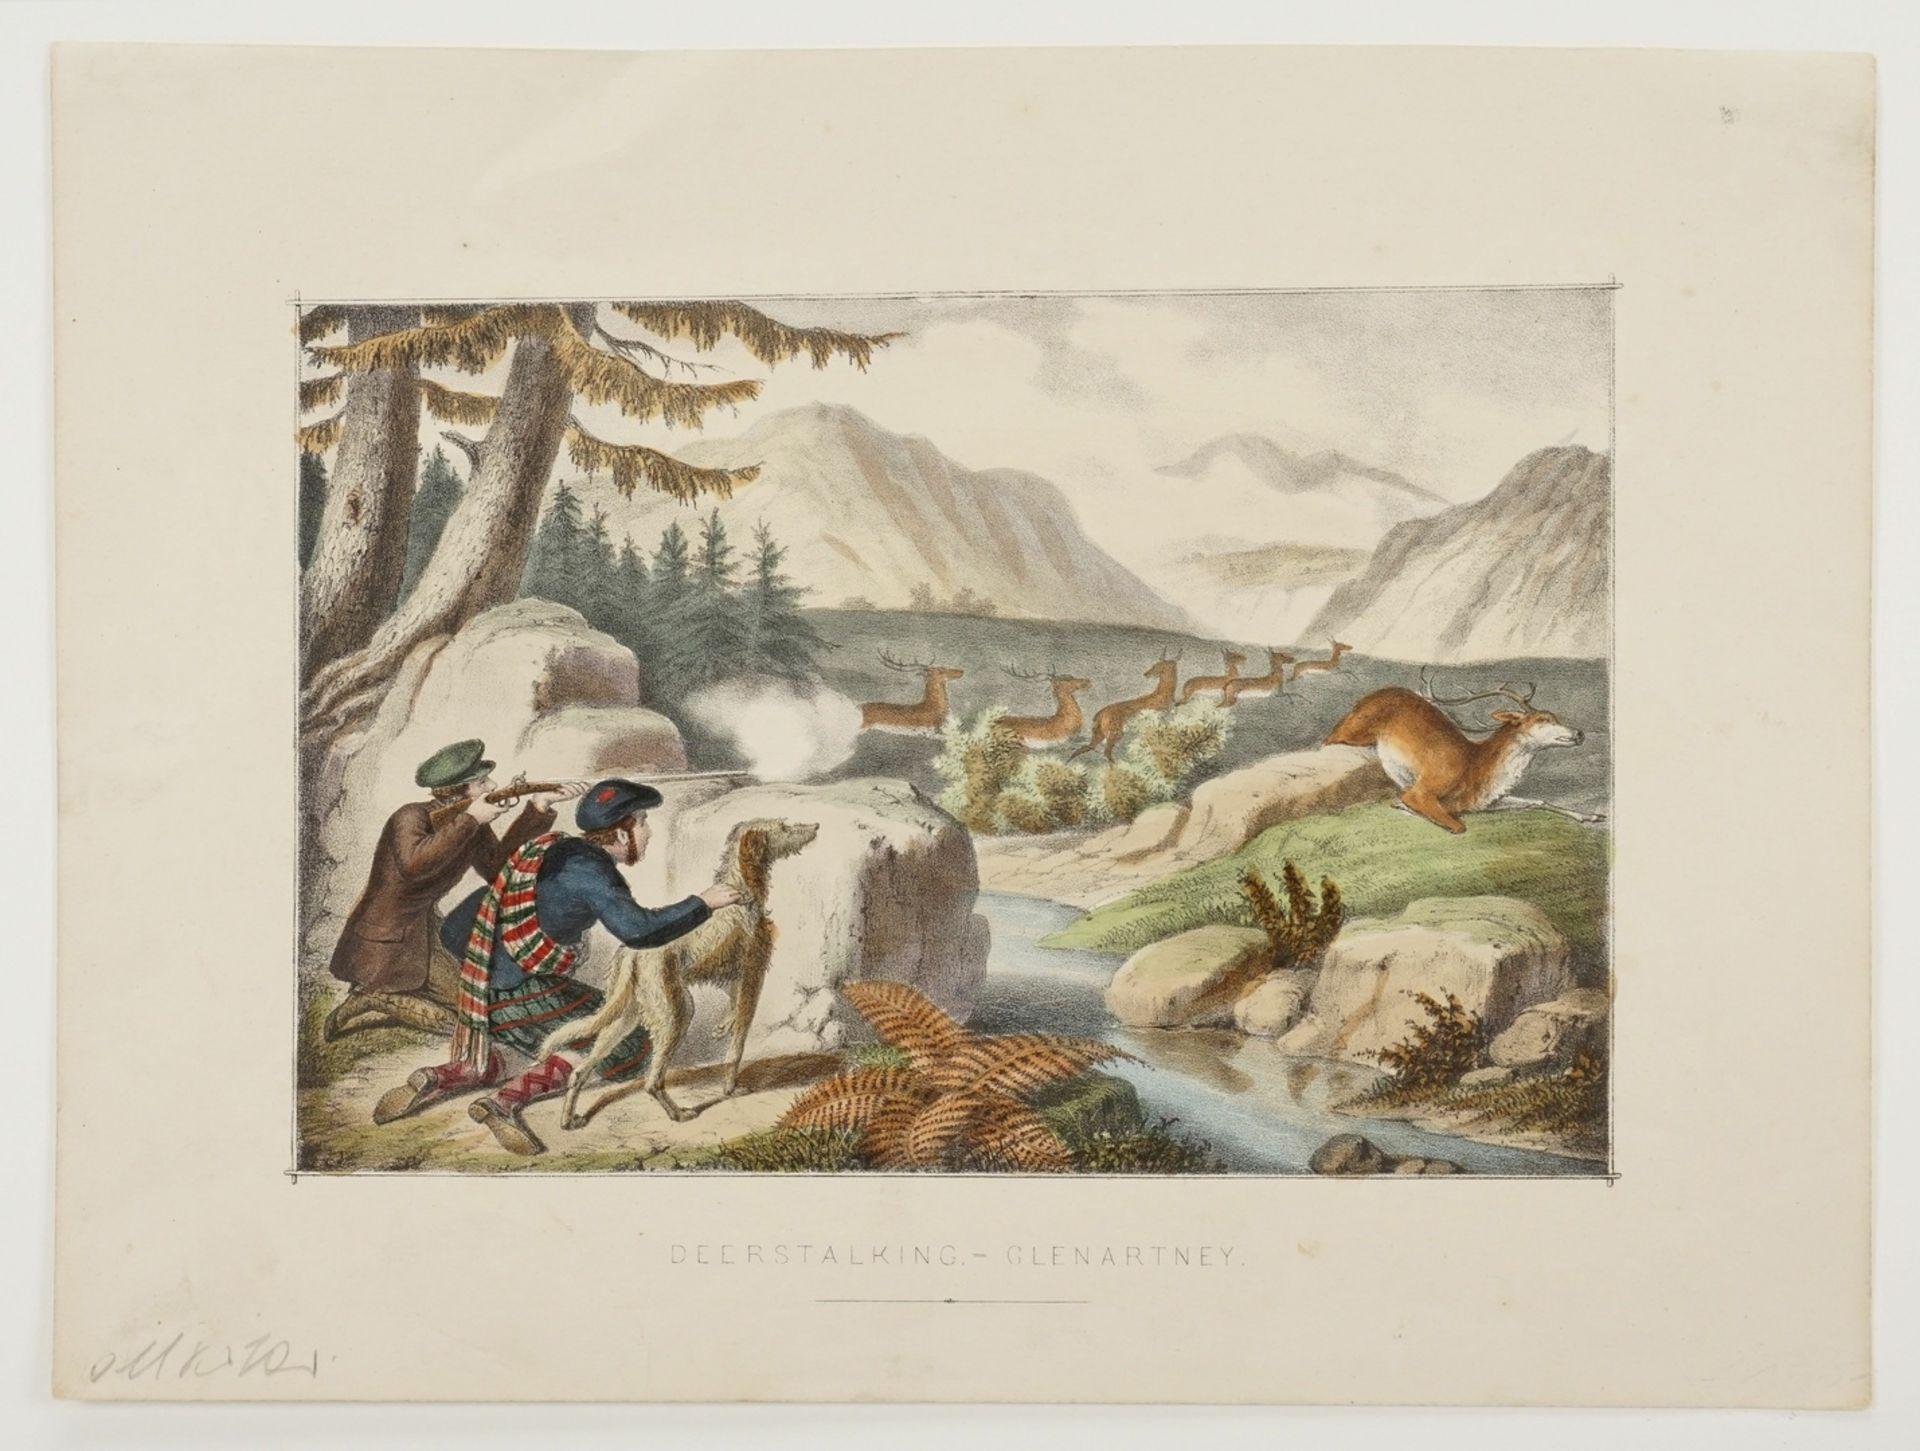 Deerstalking - Glenartney - Bild 3 aus 3